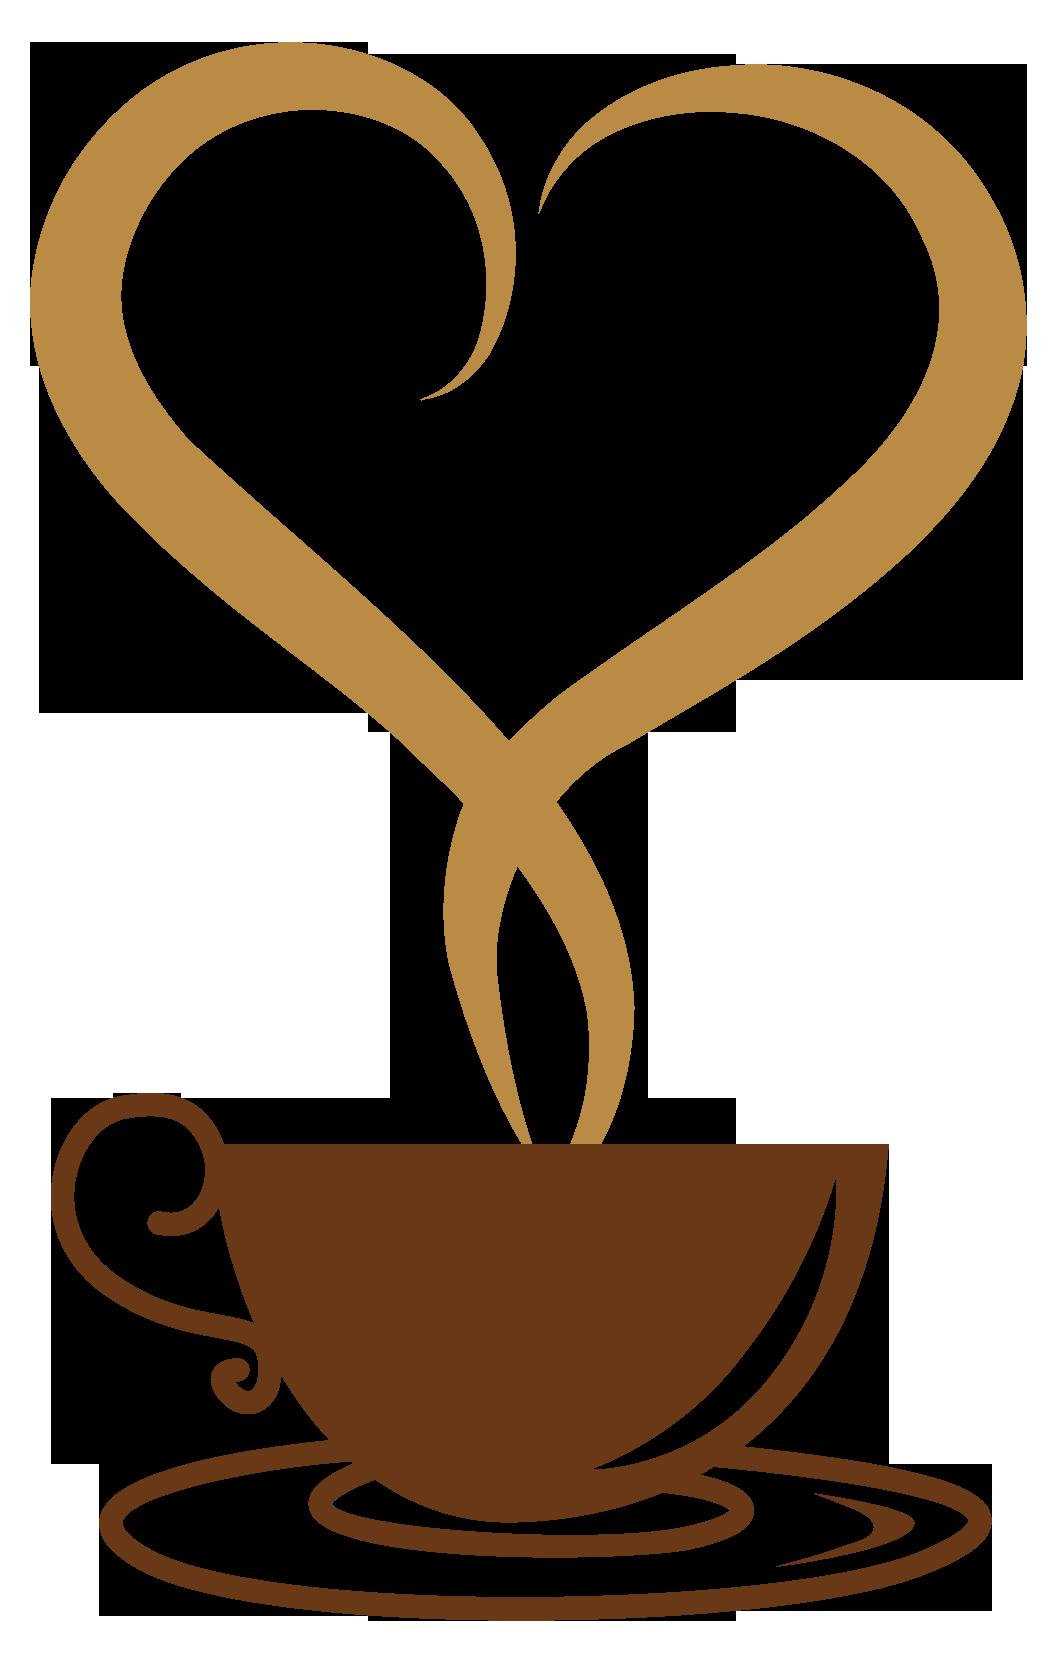 Tea cup coffee cup tea clip art free clipart 4 2